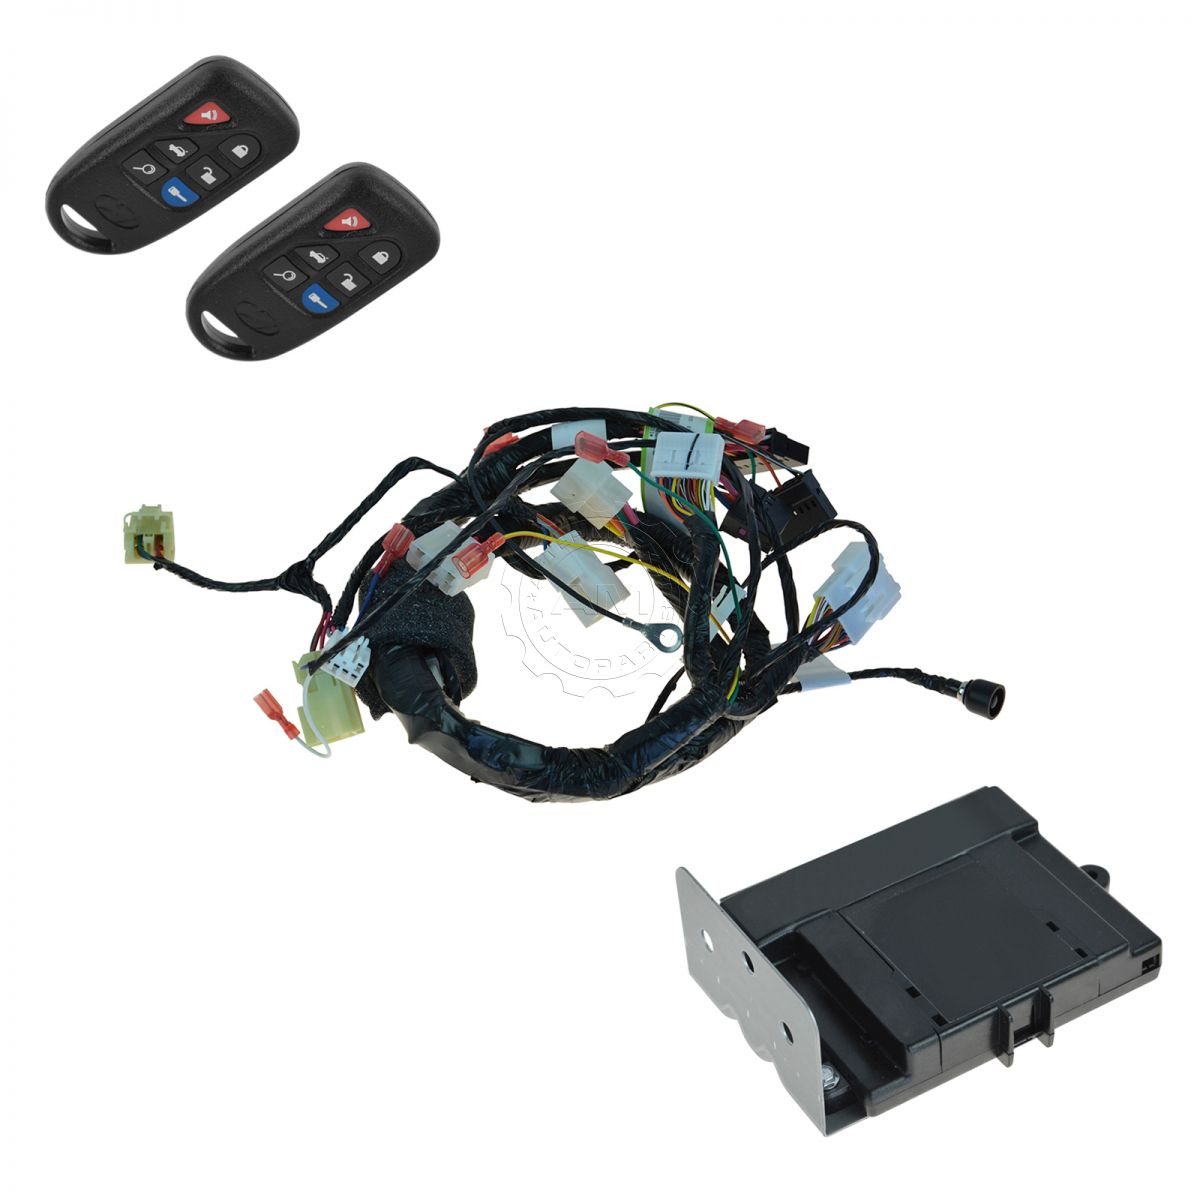 2011 14 hyundai sonata remote starter autos post. Black Bedroom Furniture Sets. Home Design Ideas